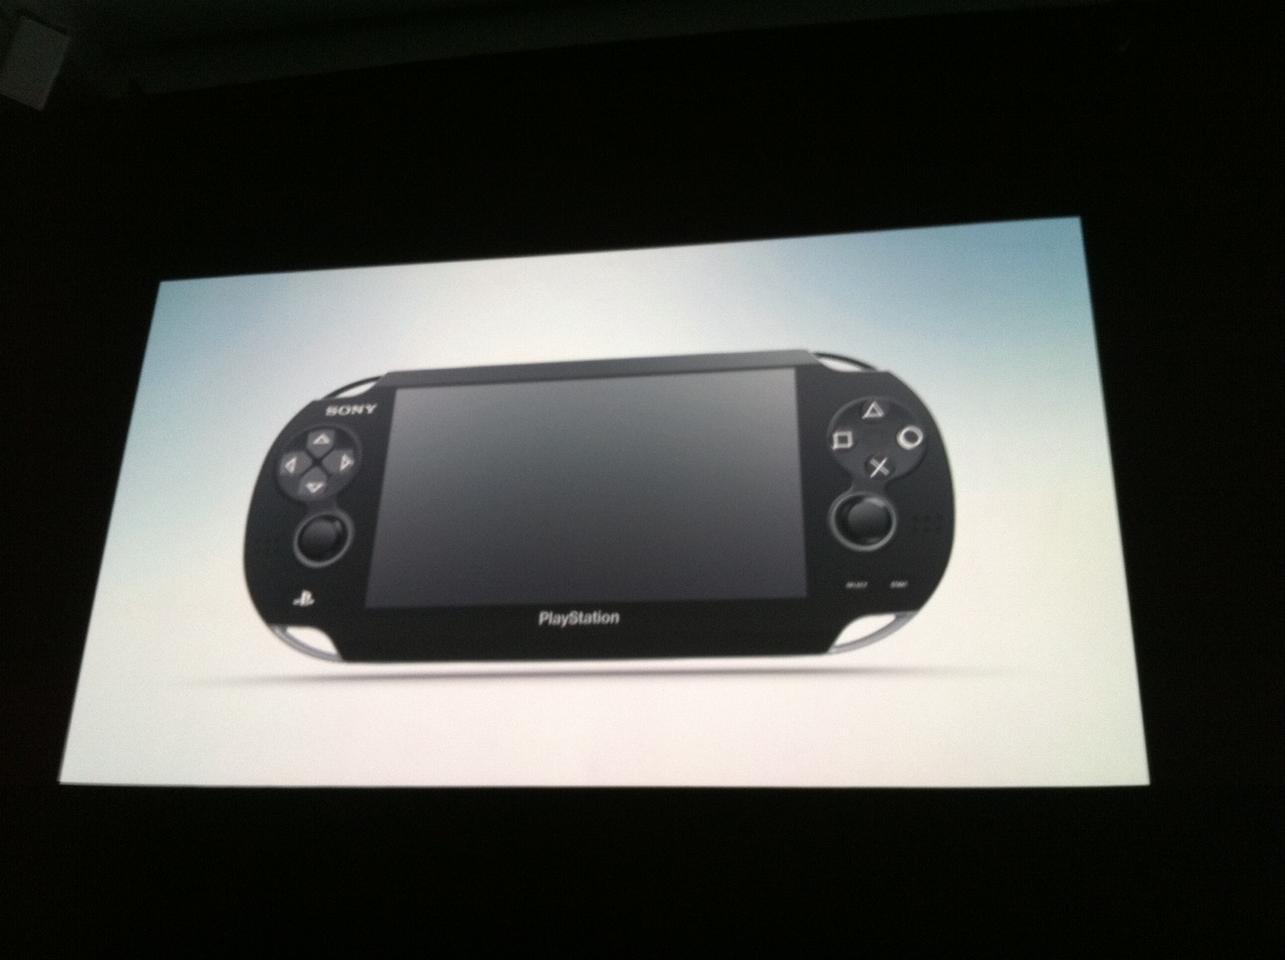 Sony PSP2 (Image via Kotaku)